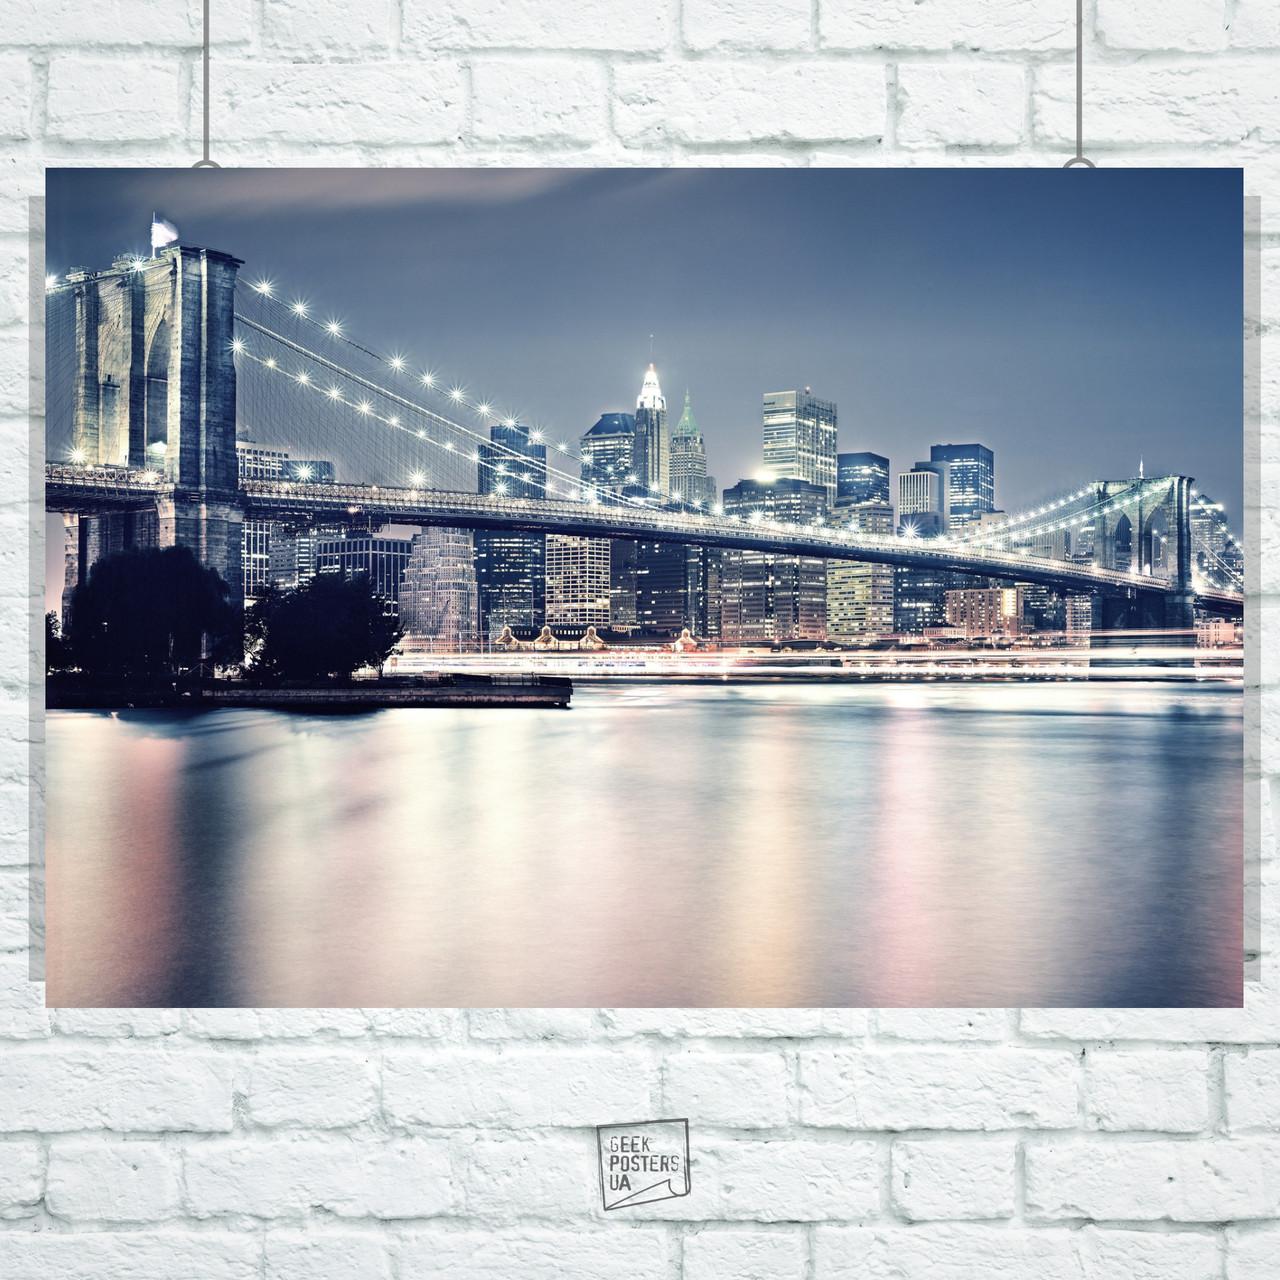 Постер Бруклинский мост ночью, Нью-Йорк. Размер 60x42см (A2). Глянцевая бумага